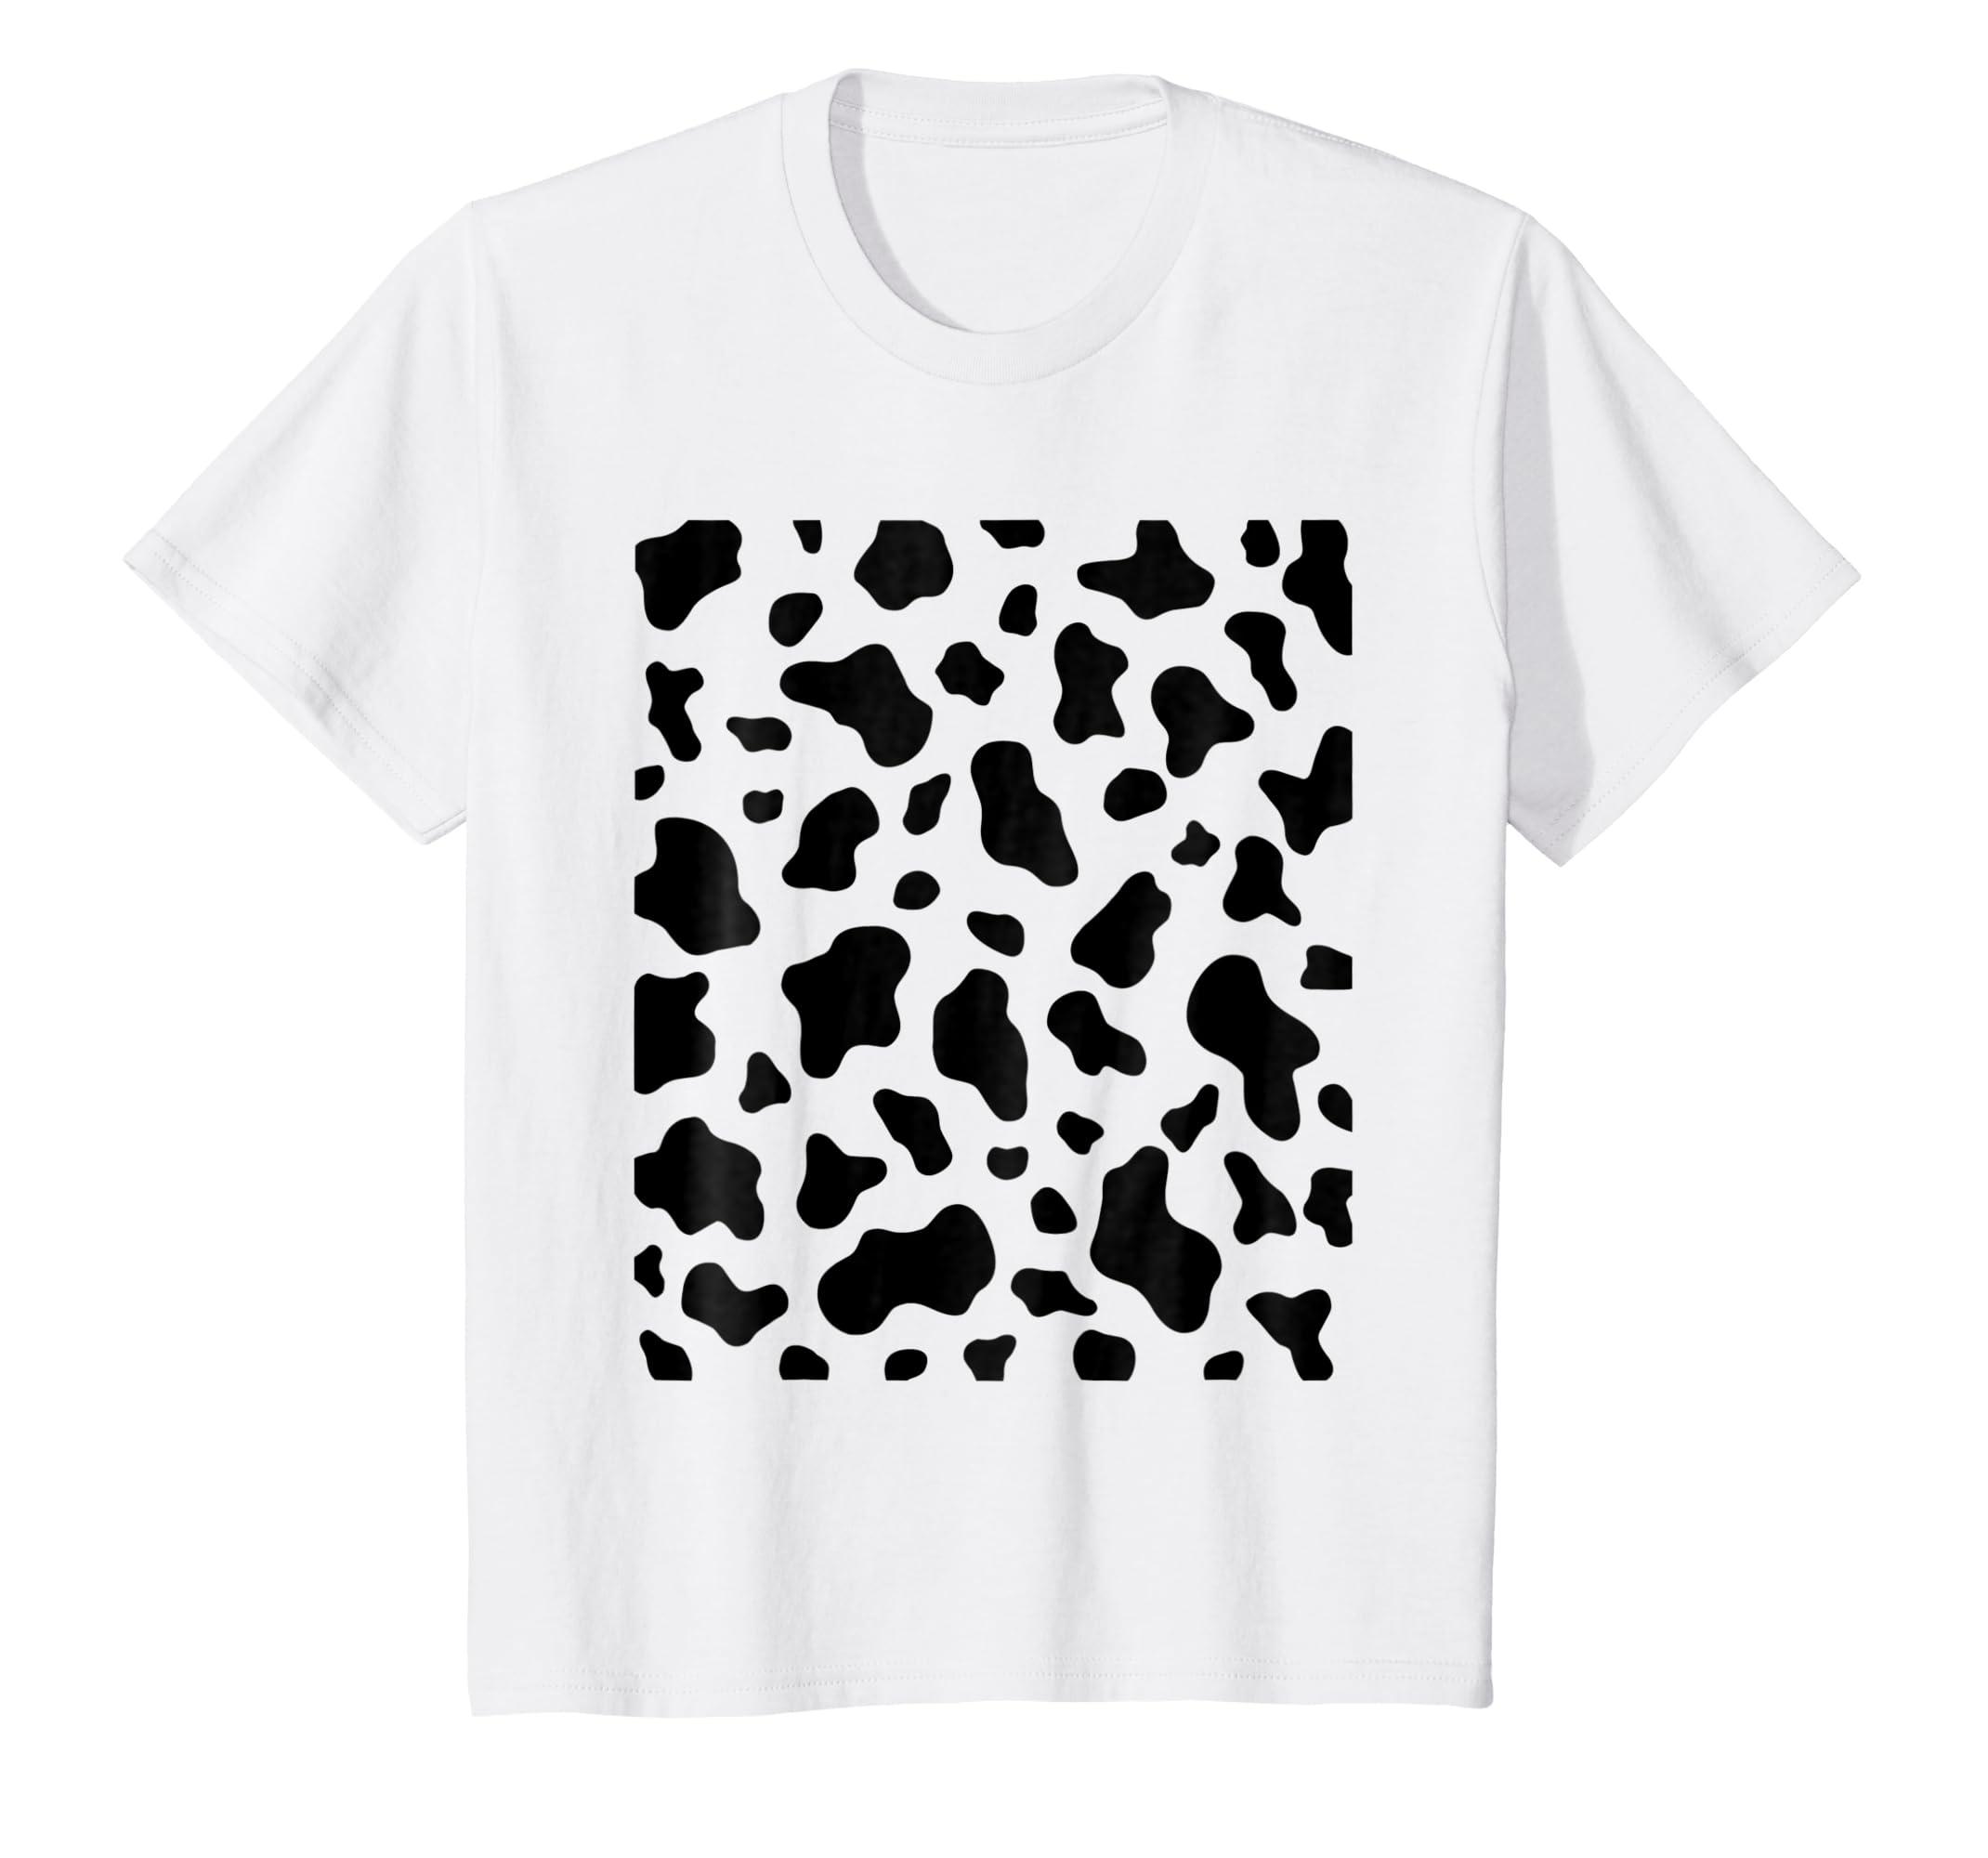 Amazon Cow Print Simple Easy Halloween Costume Idea Tee